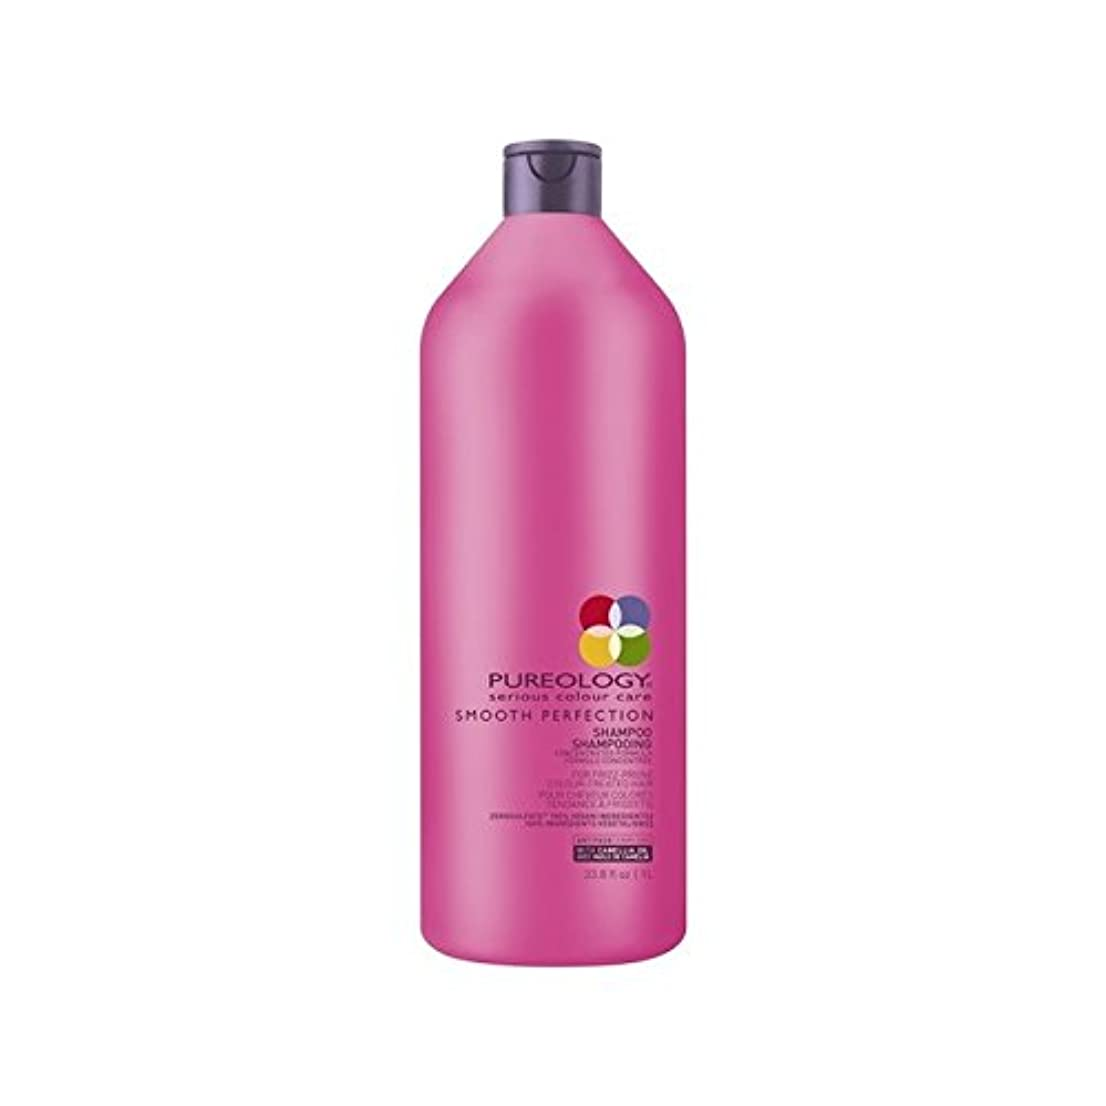 Pureology Smooth Perfection Shampoo (1000ml) - 平滑完全シャンプー(千ミリリットル) [並行輸入品]